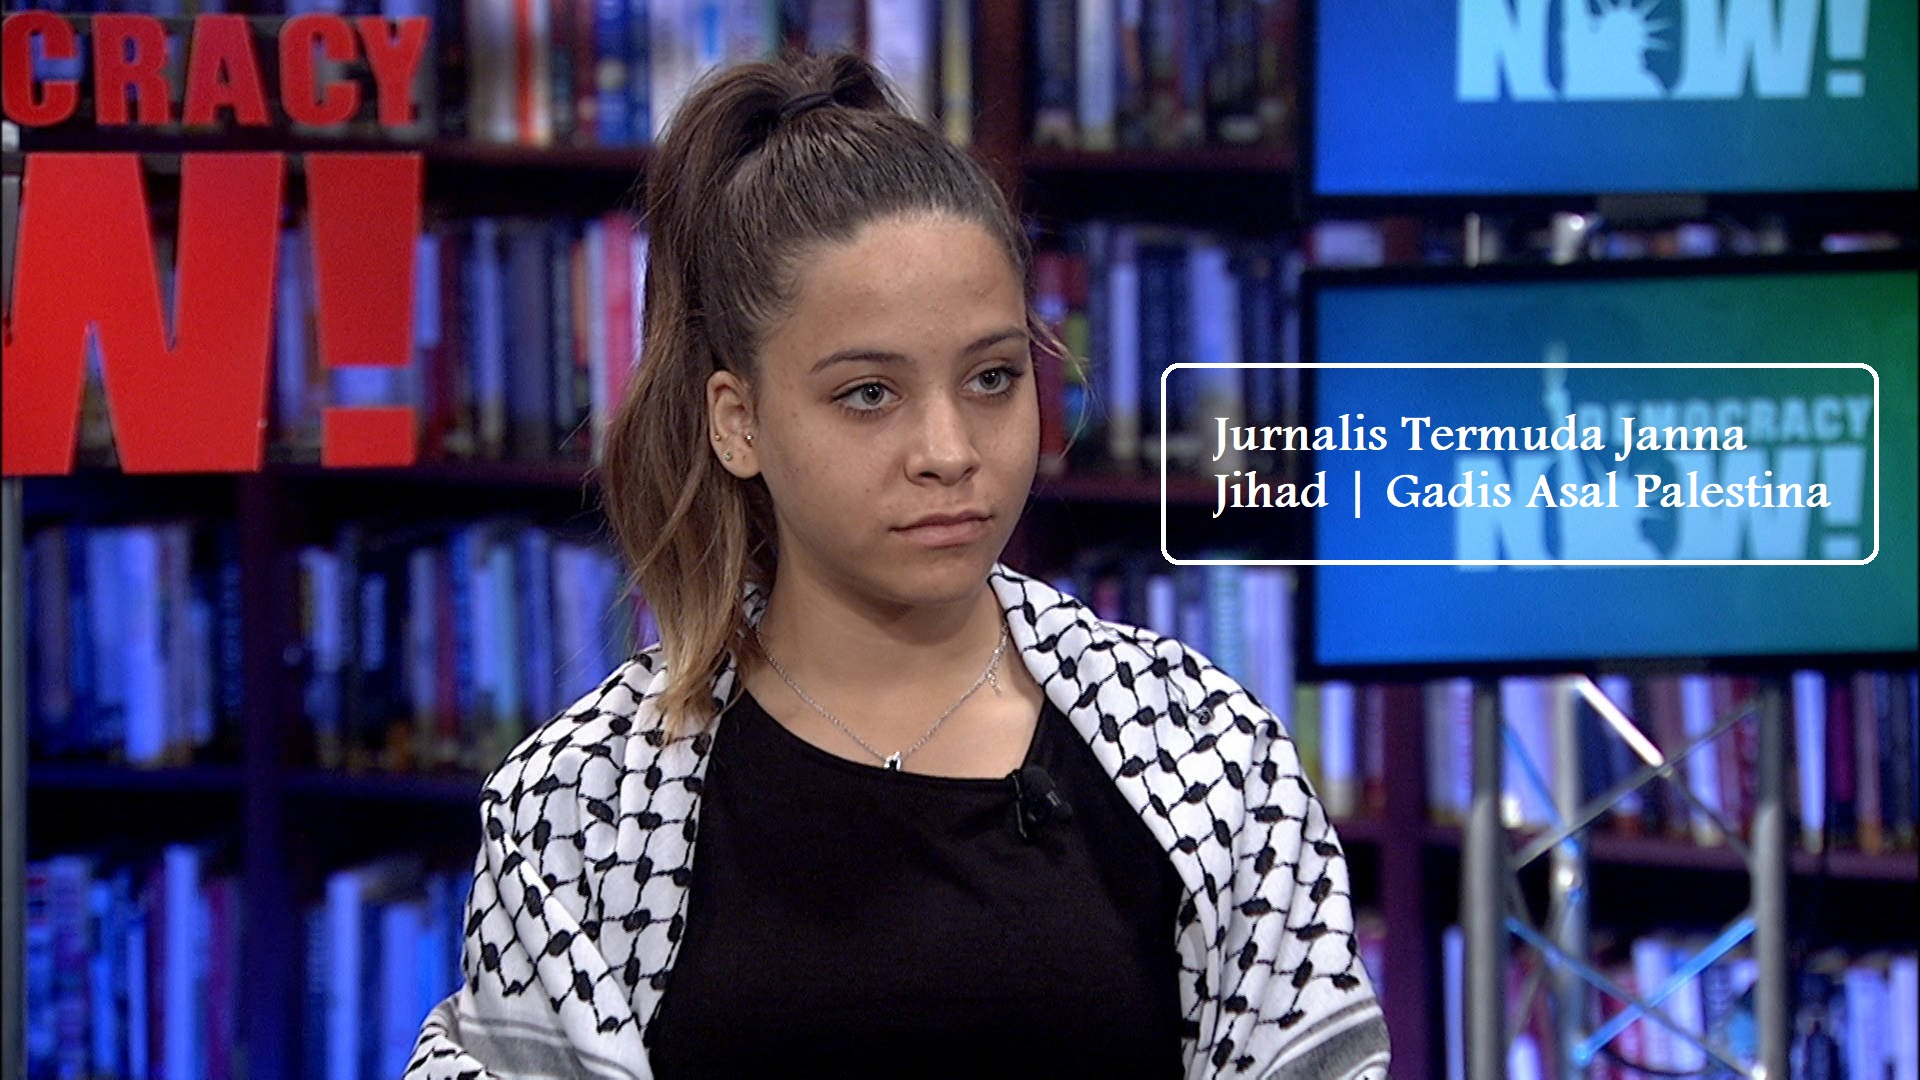 Jurnalis Termuda Janna Jihad | Gadis Asal Palestina